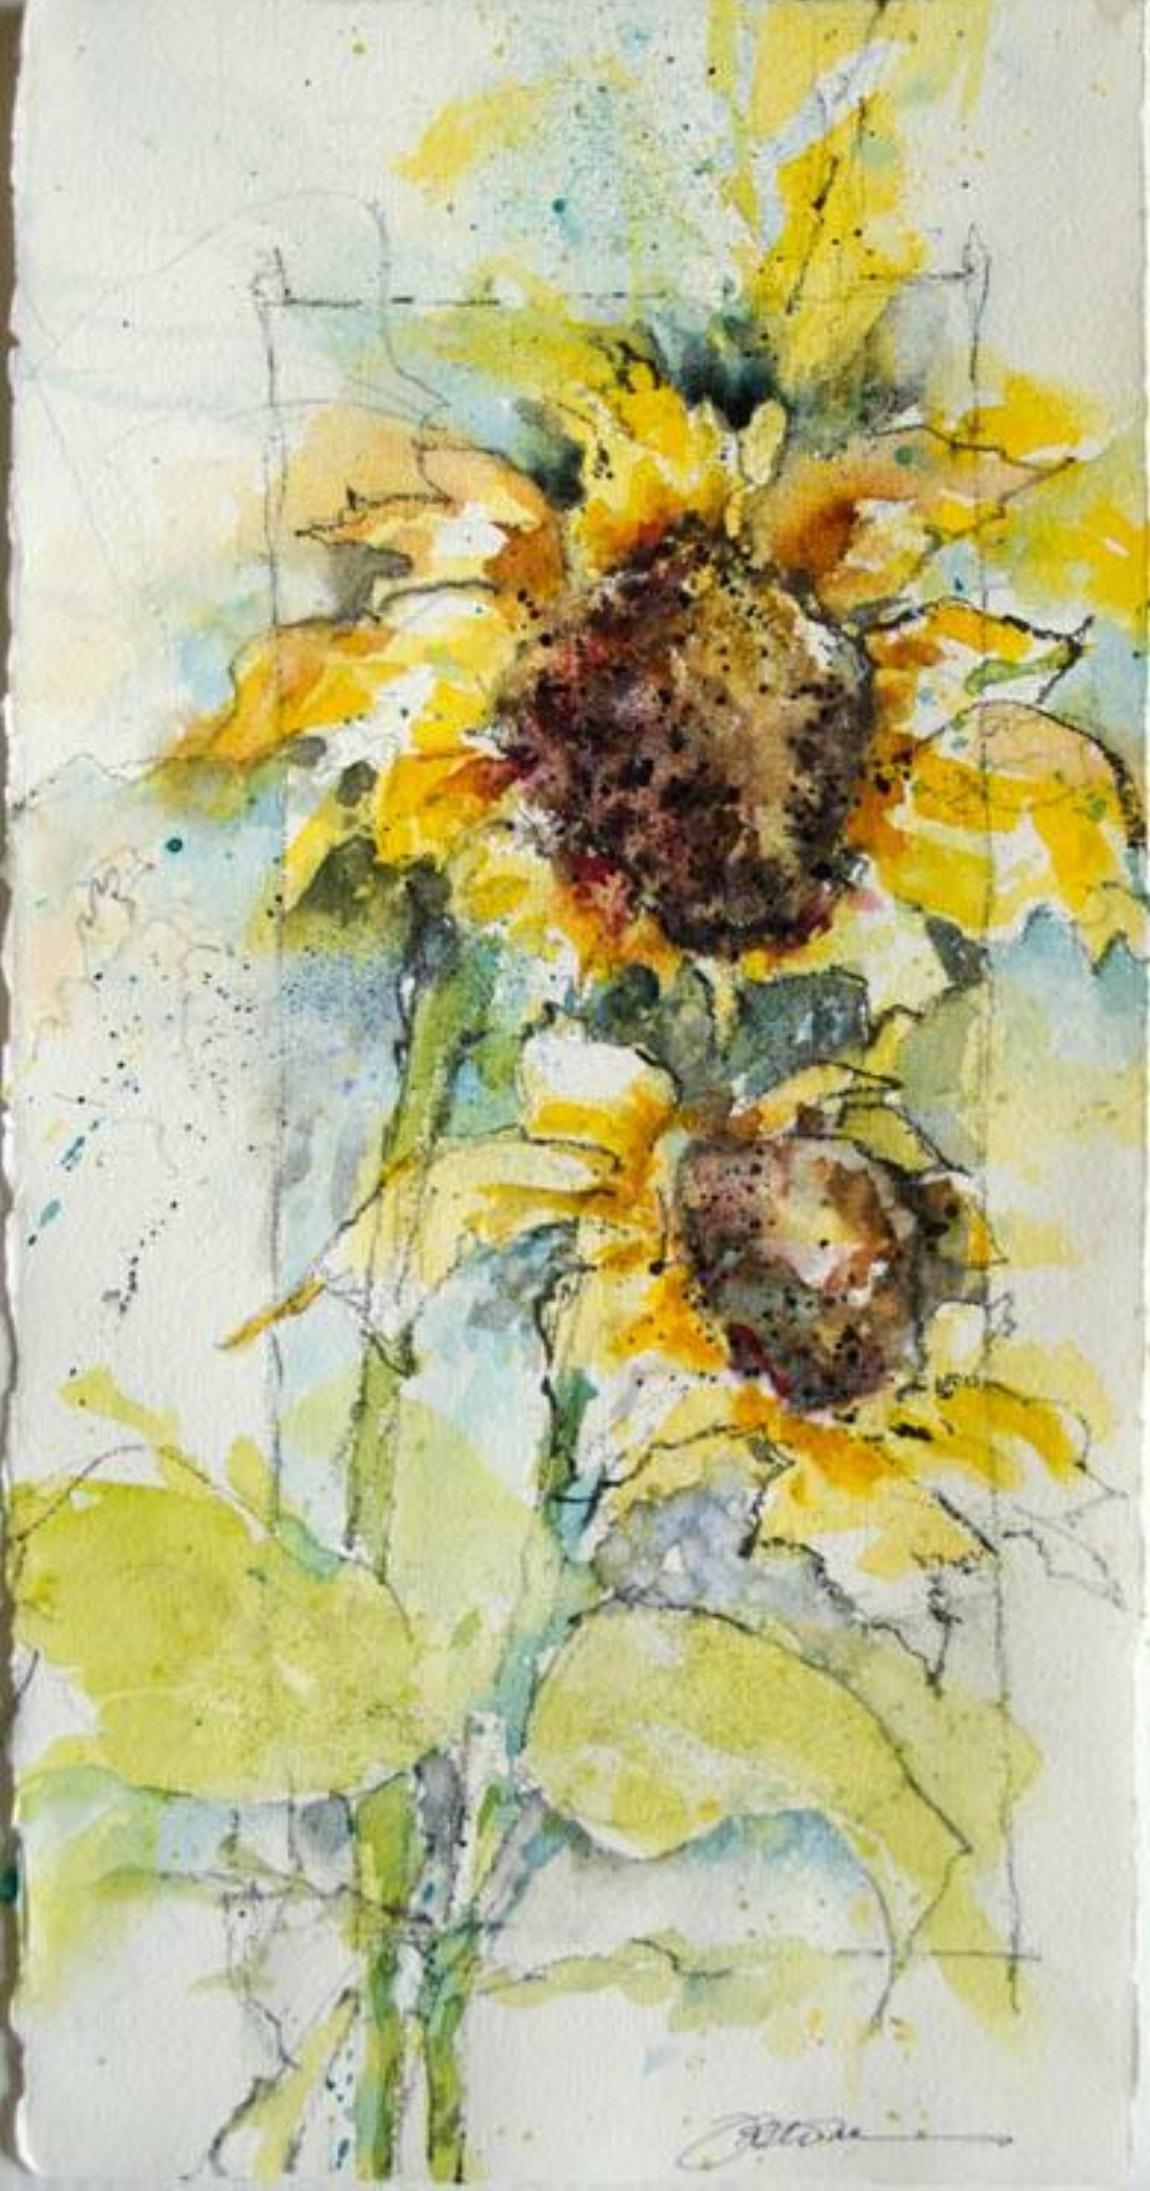 Watercolor on paper. SOLD by Jennifer Stone at Jennifer Stone Artwork